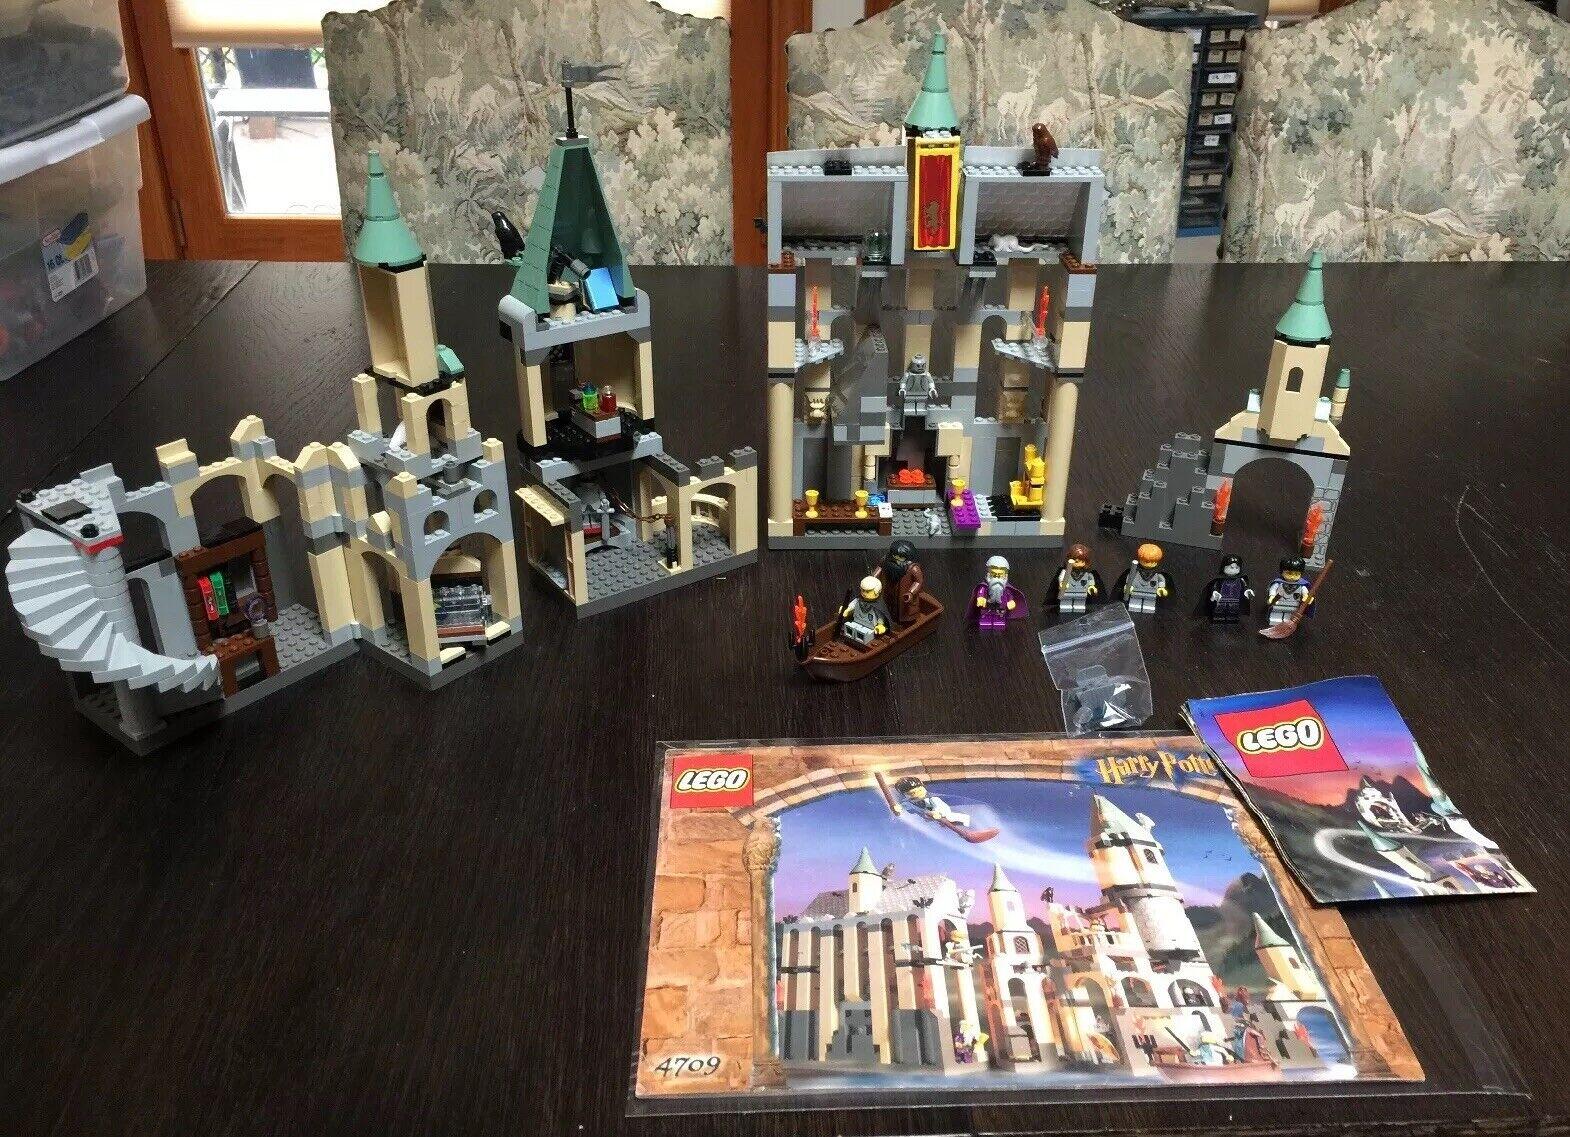 4709 Lego Harry Potter Hogwarts Castillo Completa Con Manual De 9 Mini Figuras Y